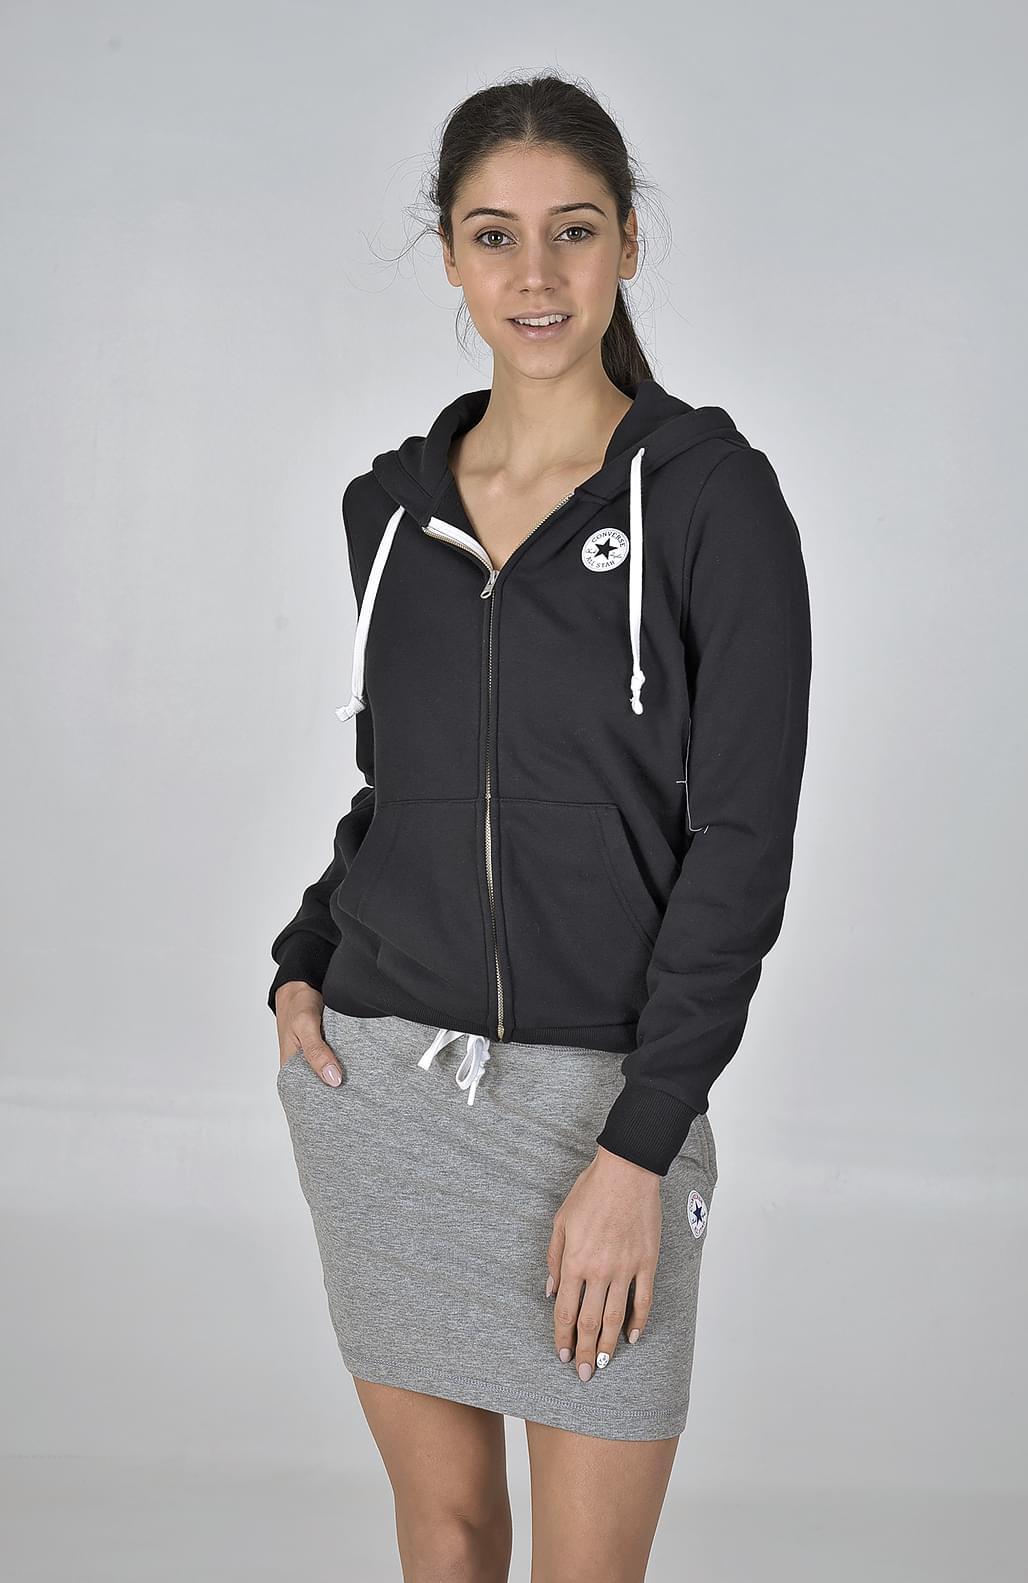 ba8aa04b8c Sportfactory | női végigzippes pulóver | Sportfactory.hu